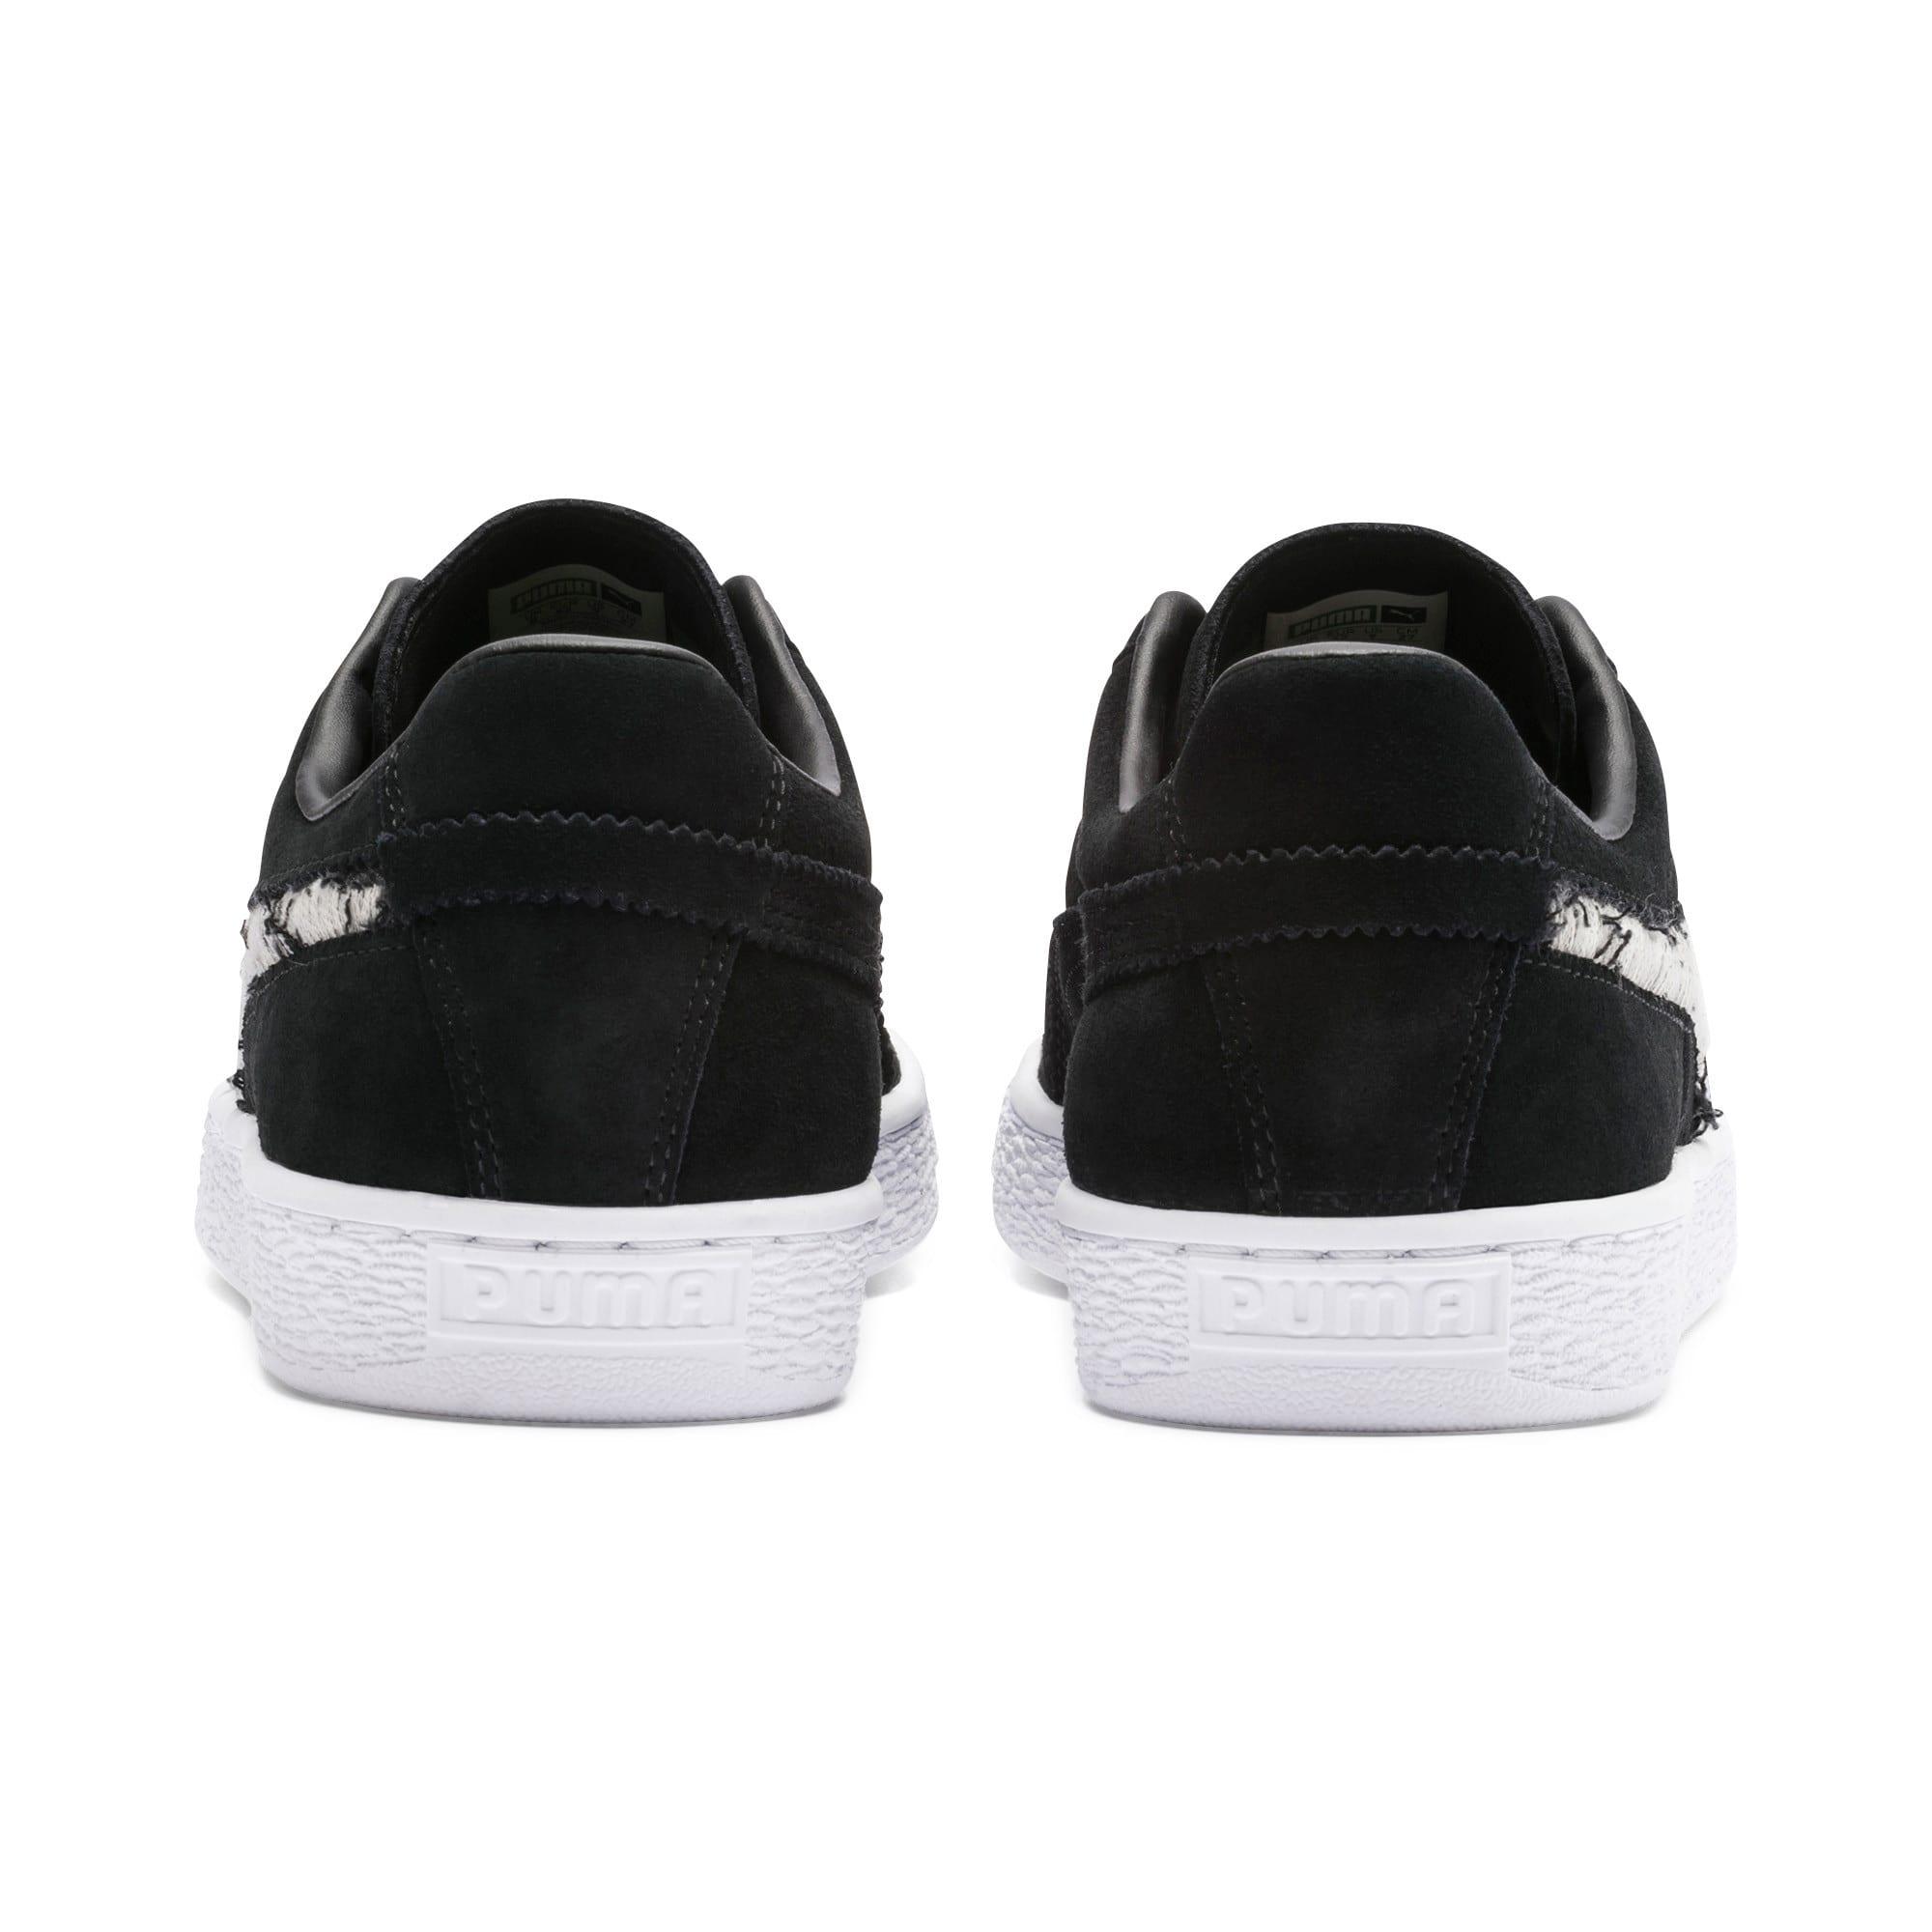 Thumbnail 5 of Suede Ripped Denim Sneakers, Puma Black-P Black-P White, medium